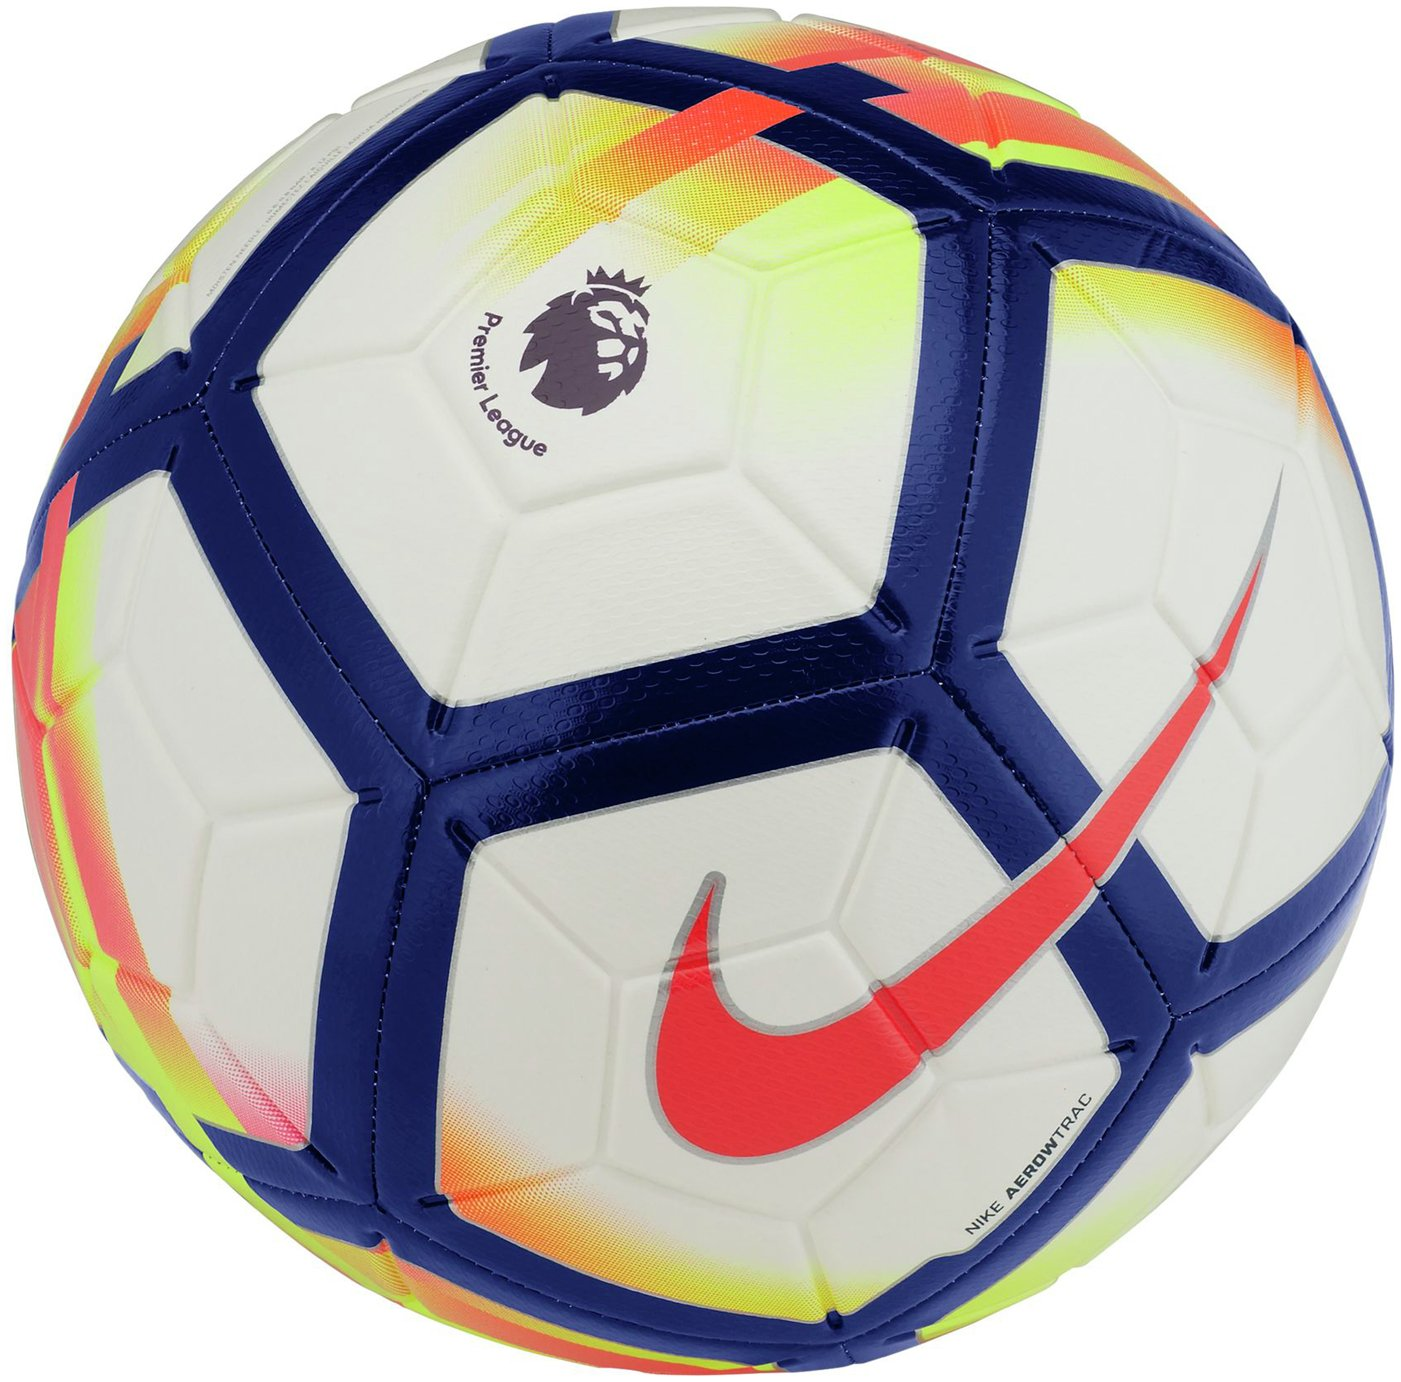 Nike Premier League Strike Football - White & Crimson